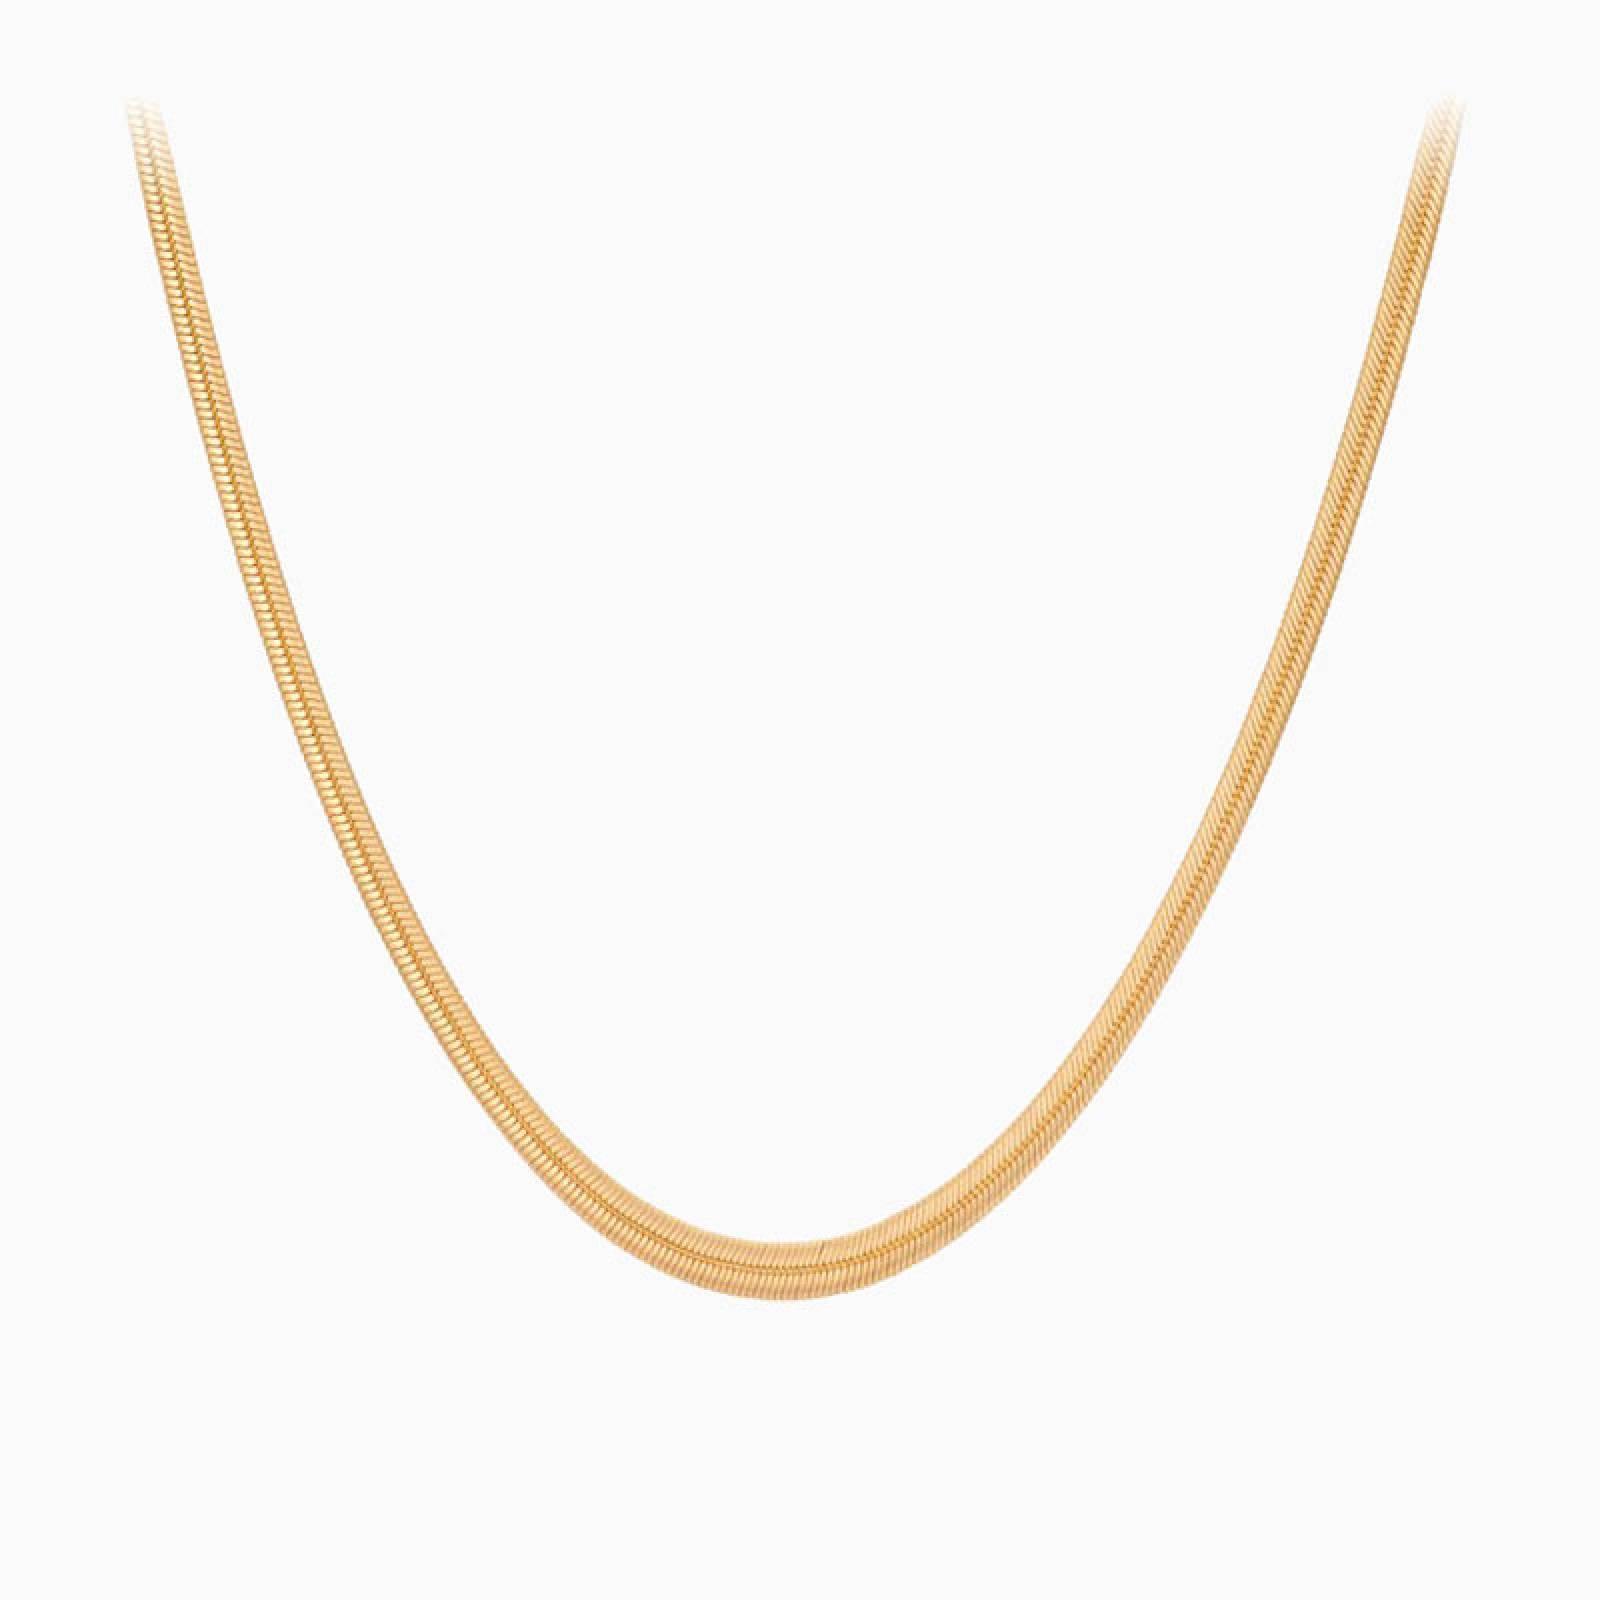 Gold Elinor Necklace By Pernille Corydon